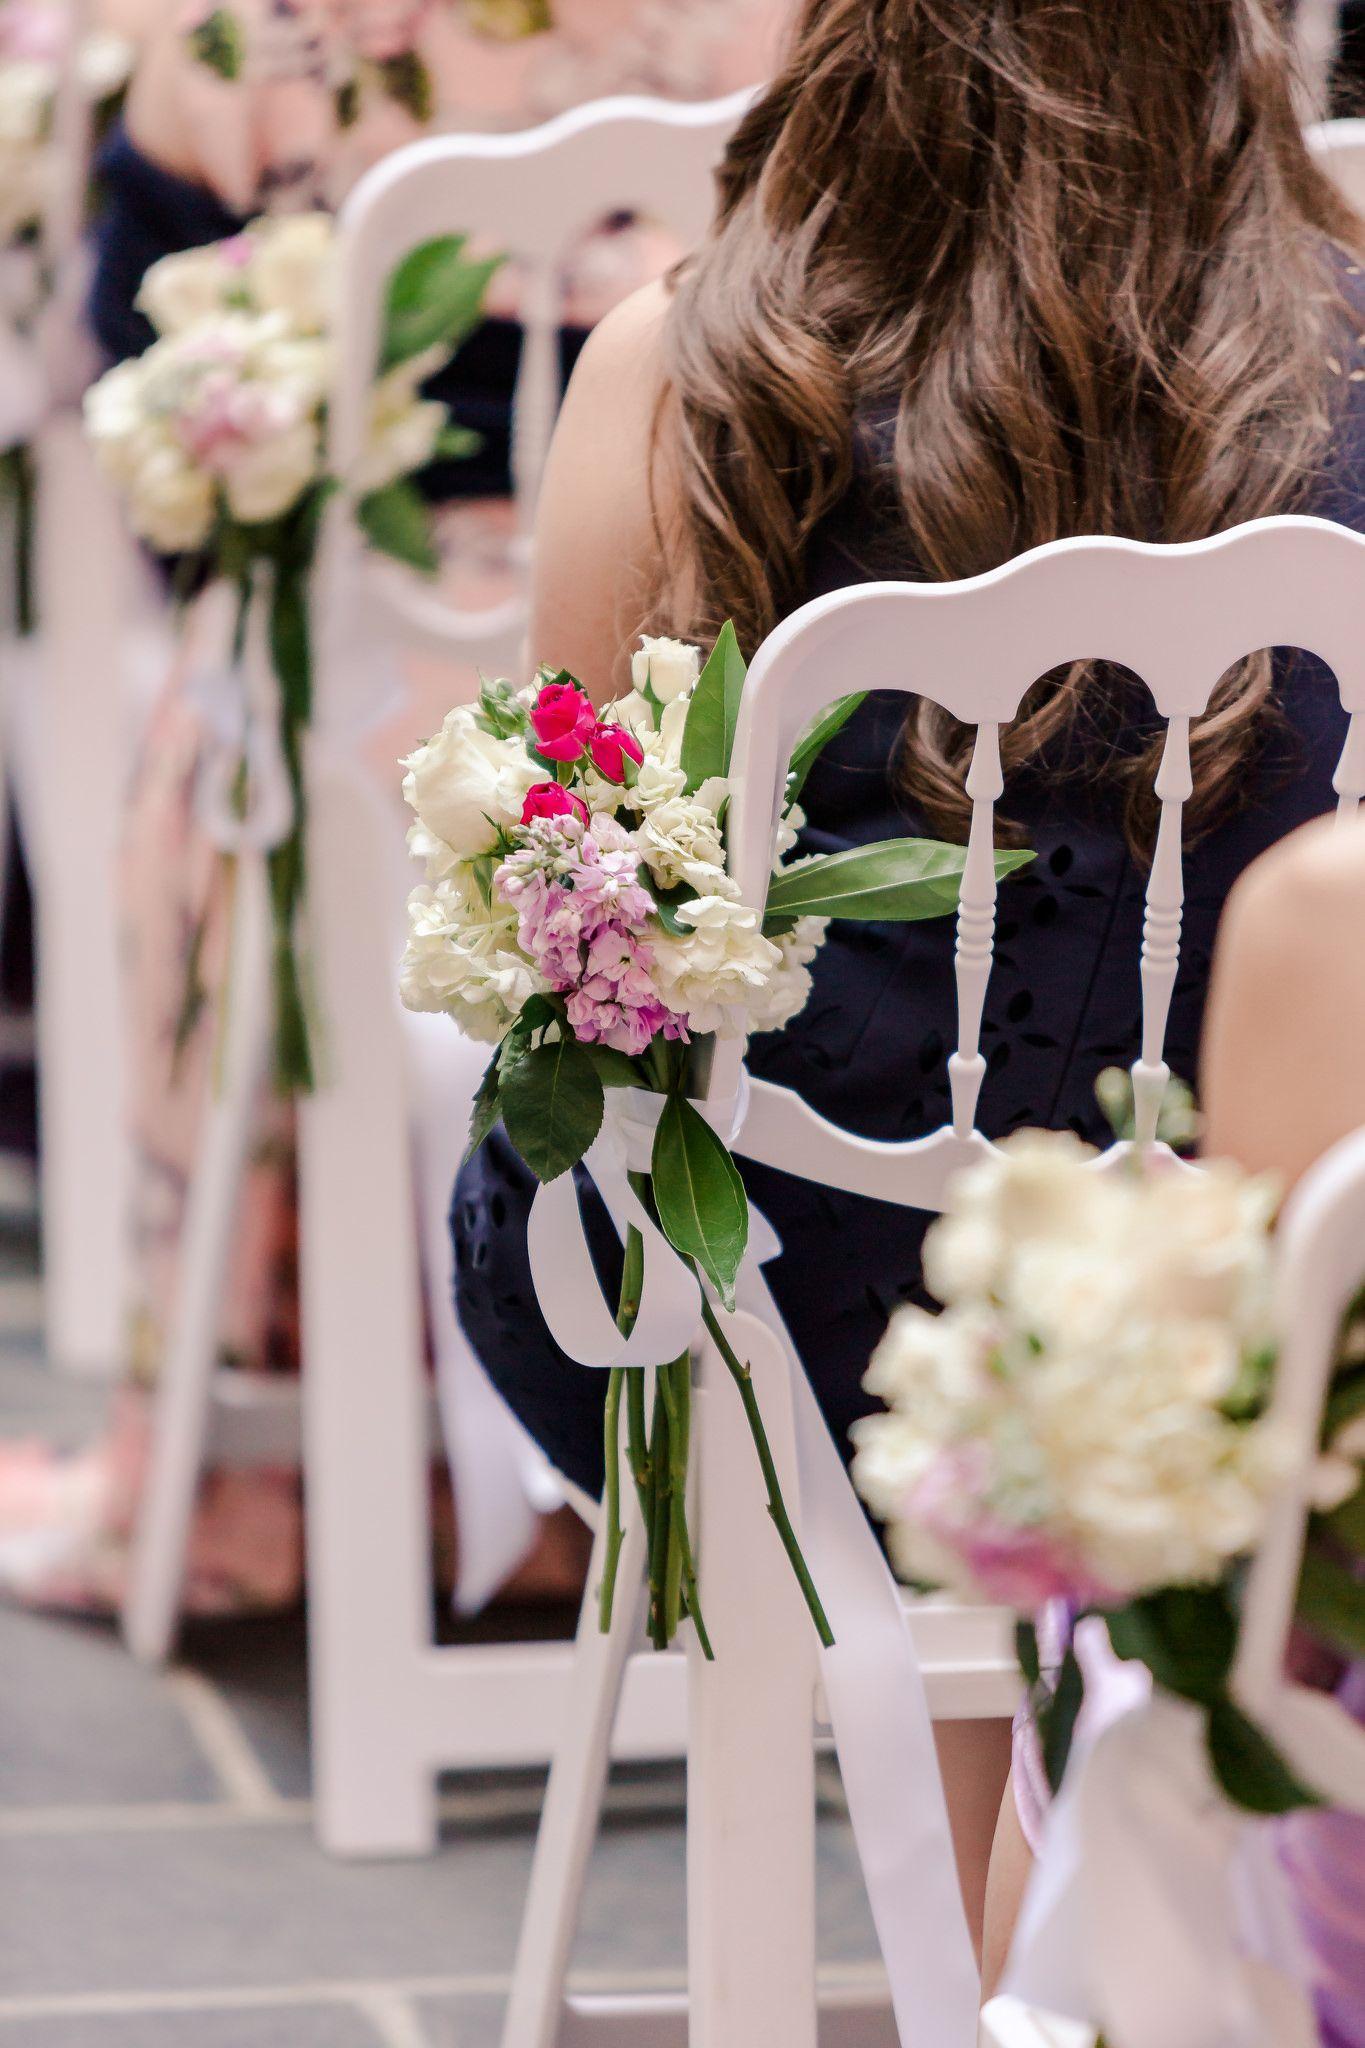 Wedding Flowers Twinbrook Floral Design Heather Ryan Photography Wedding Upscale Weddings Floral Design